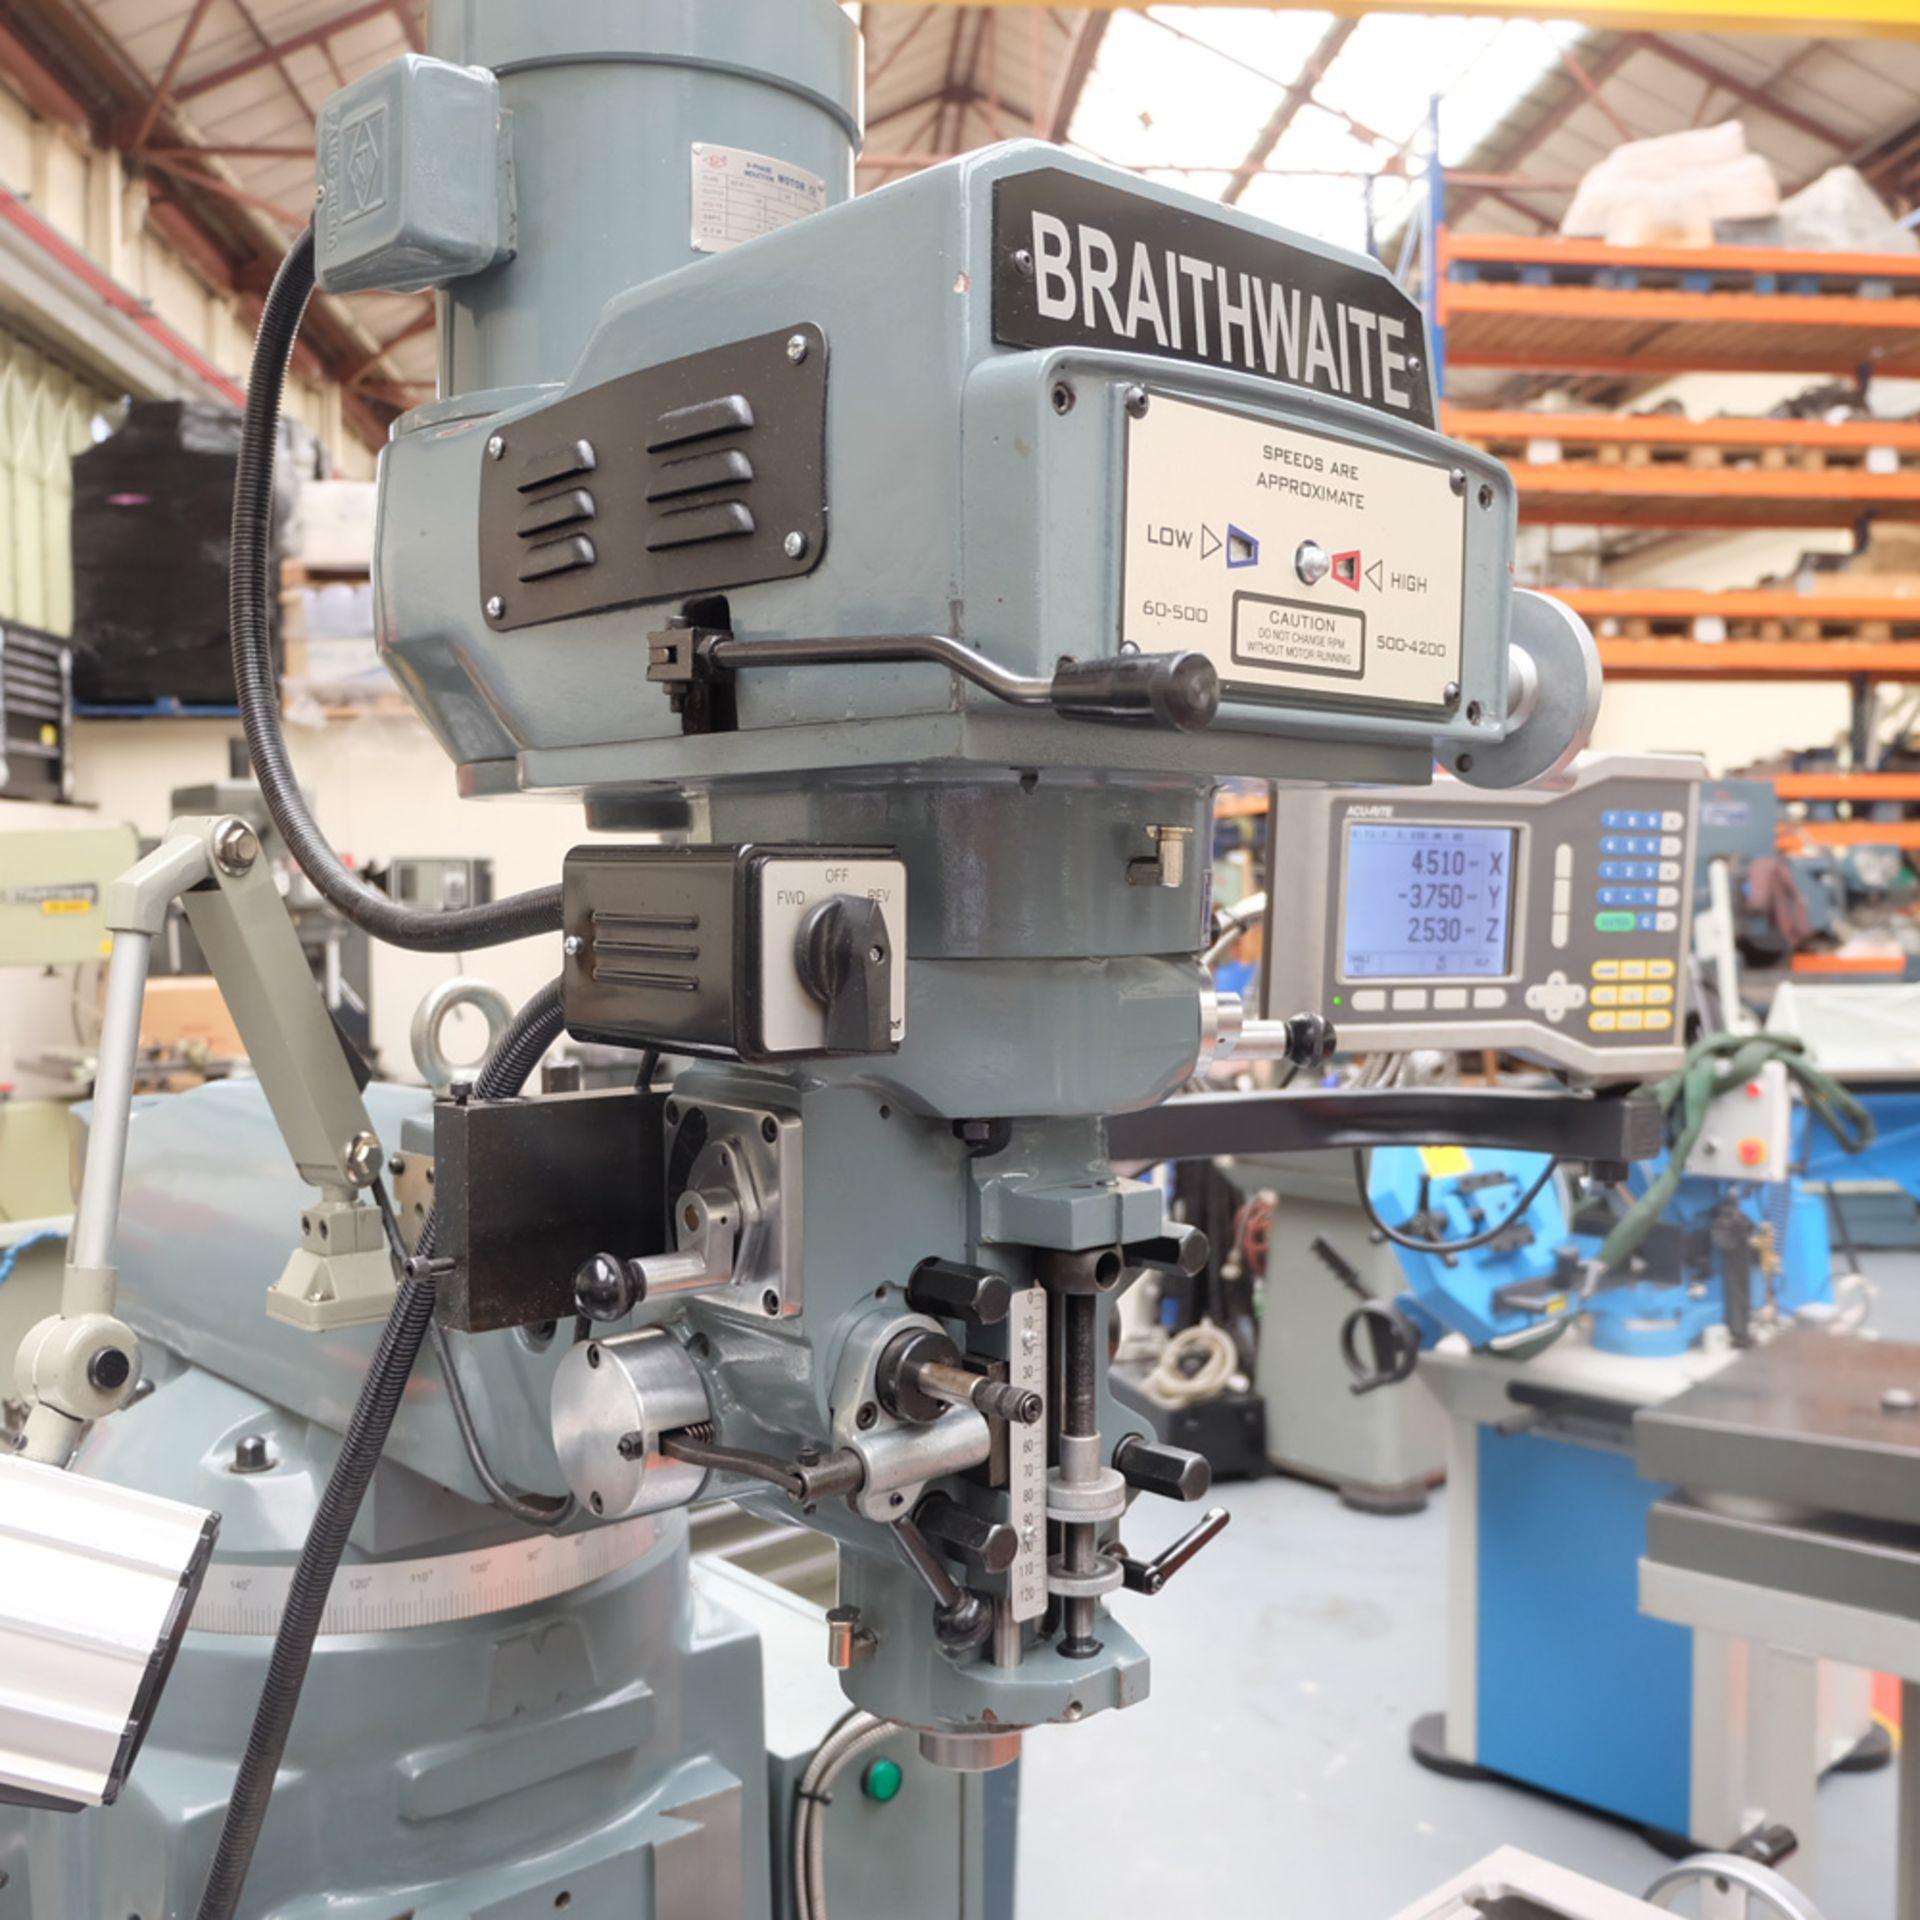 Braithwaite Model 6323B 3HP Vari Speed Turret Mill. - Image 3 of 20